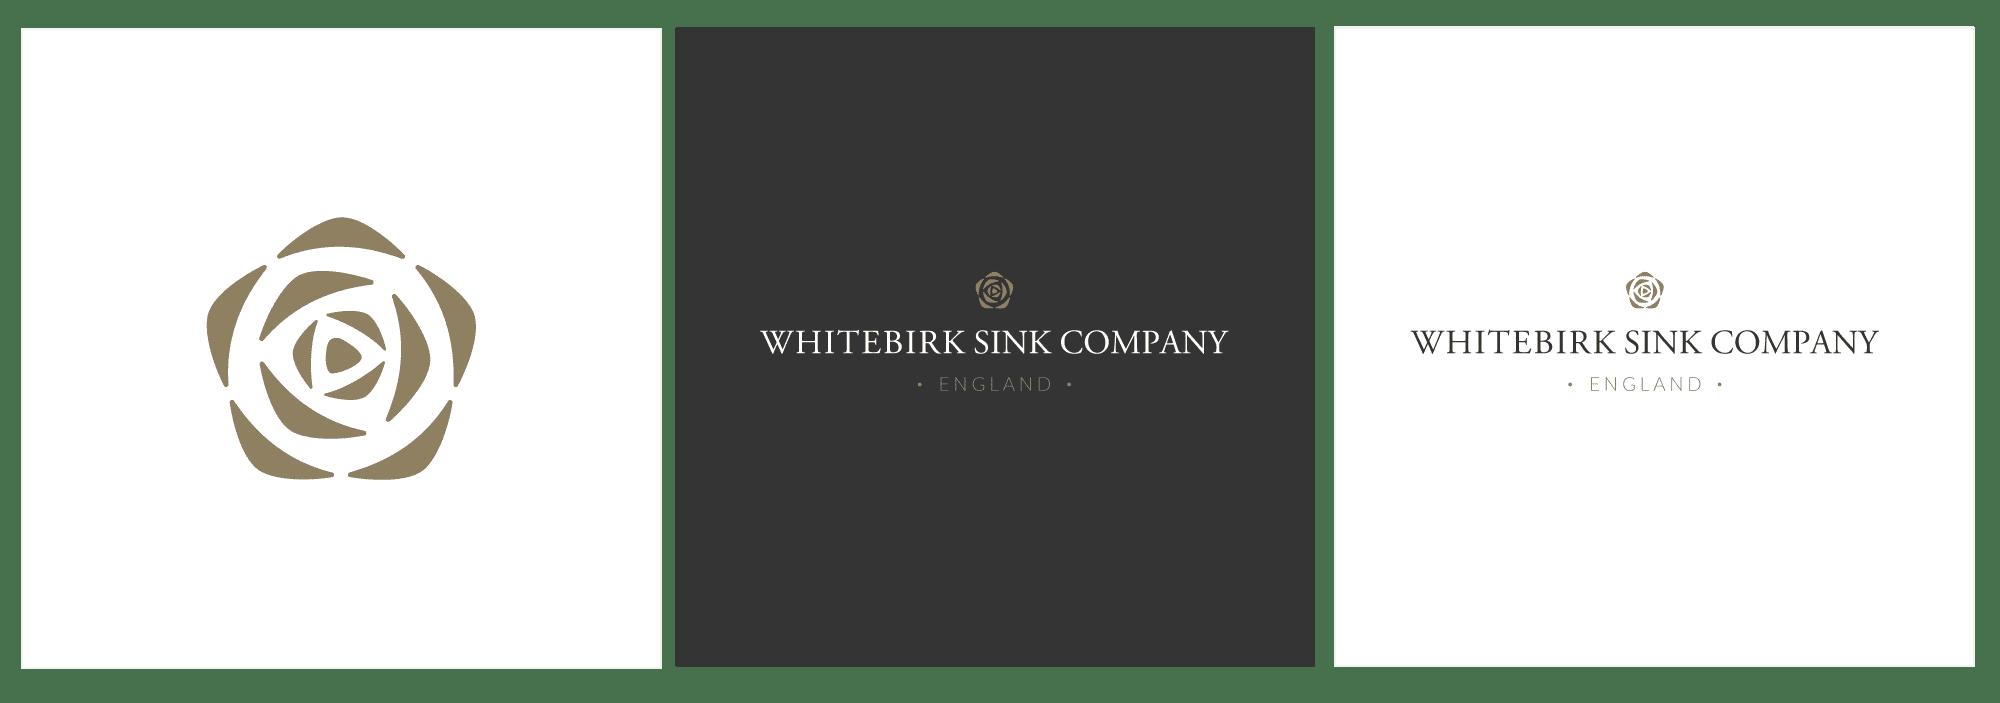 Whitebirk Sink Company - Branding